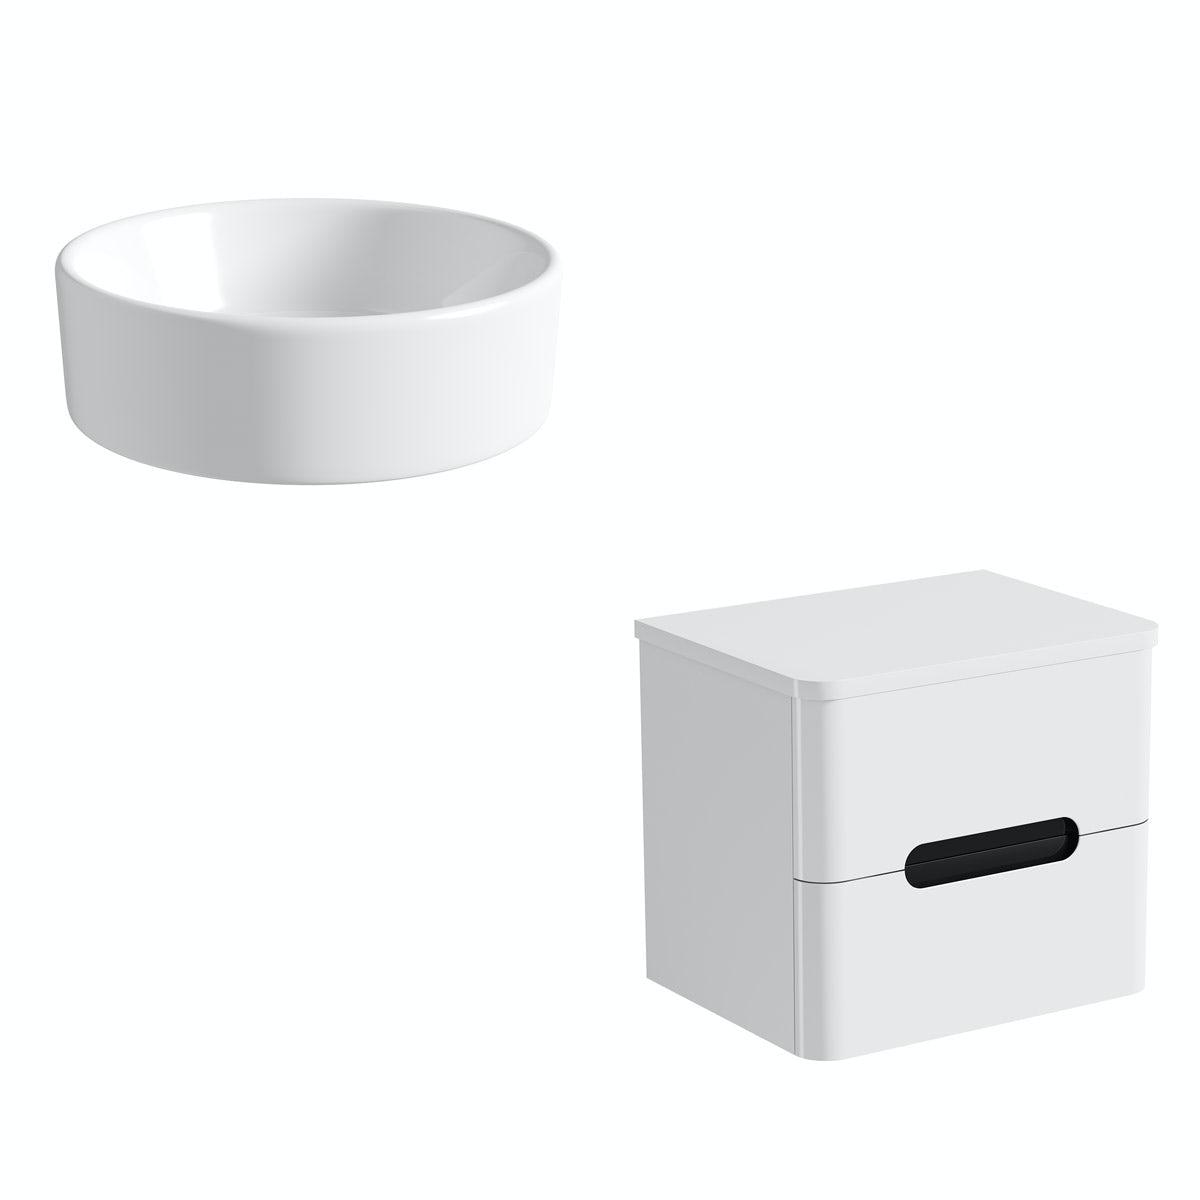 Mode Ellis essen wall hung countertop drawer unit 600mm with Calhoun basin